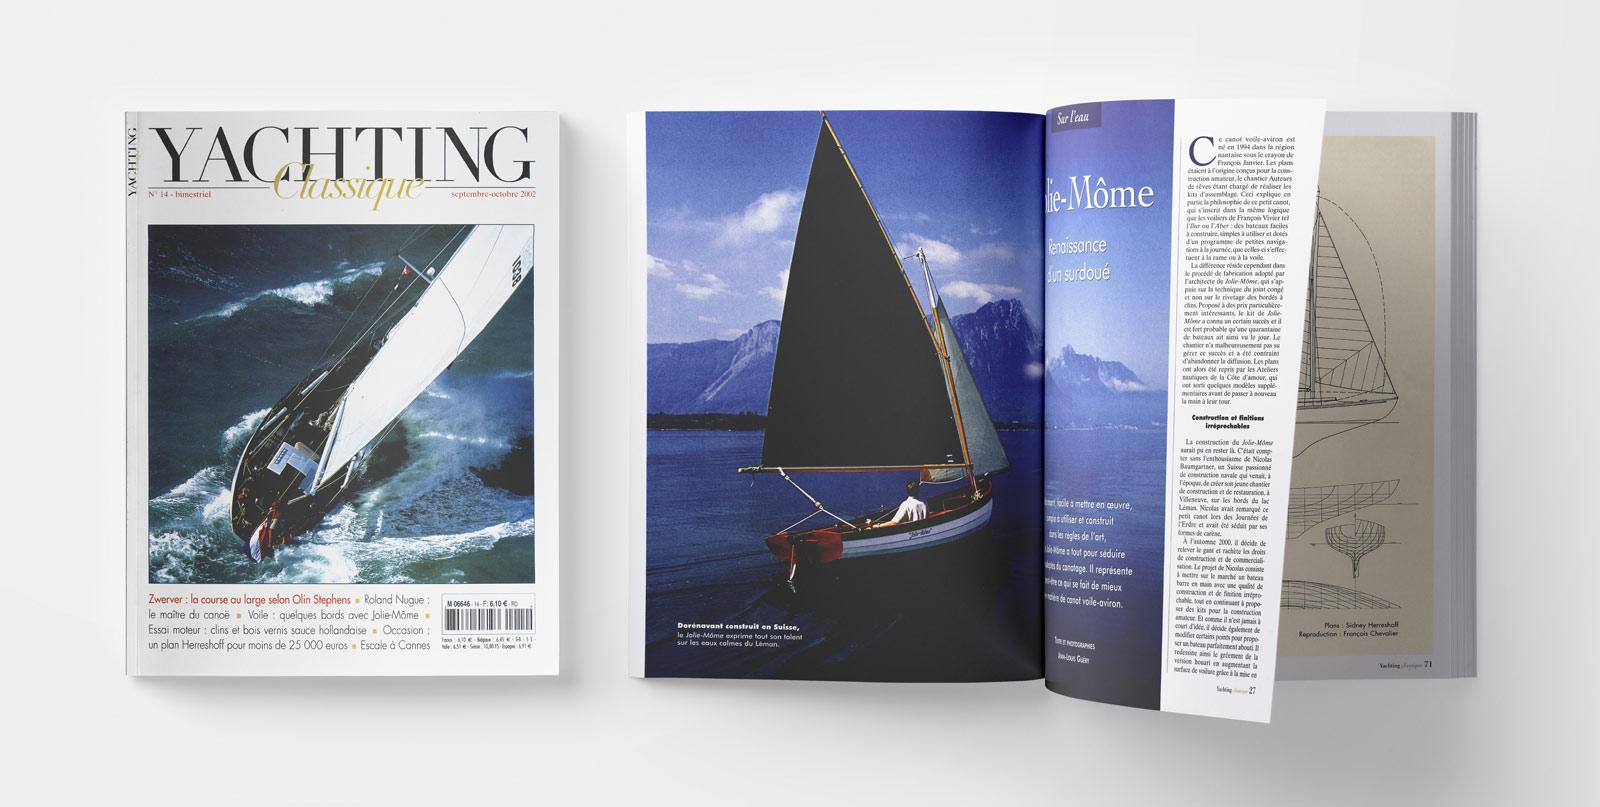 revue Yachting Classique des Editions Van de Velde